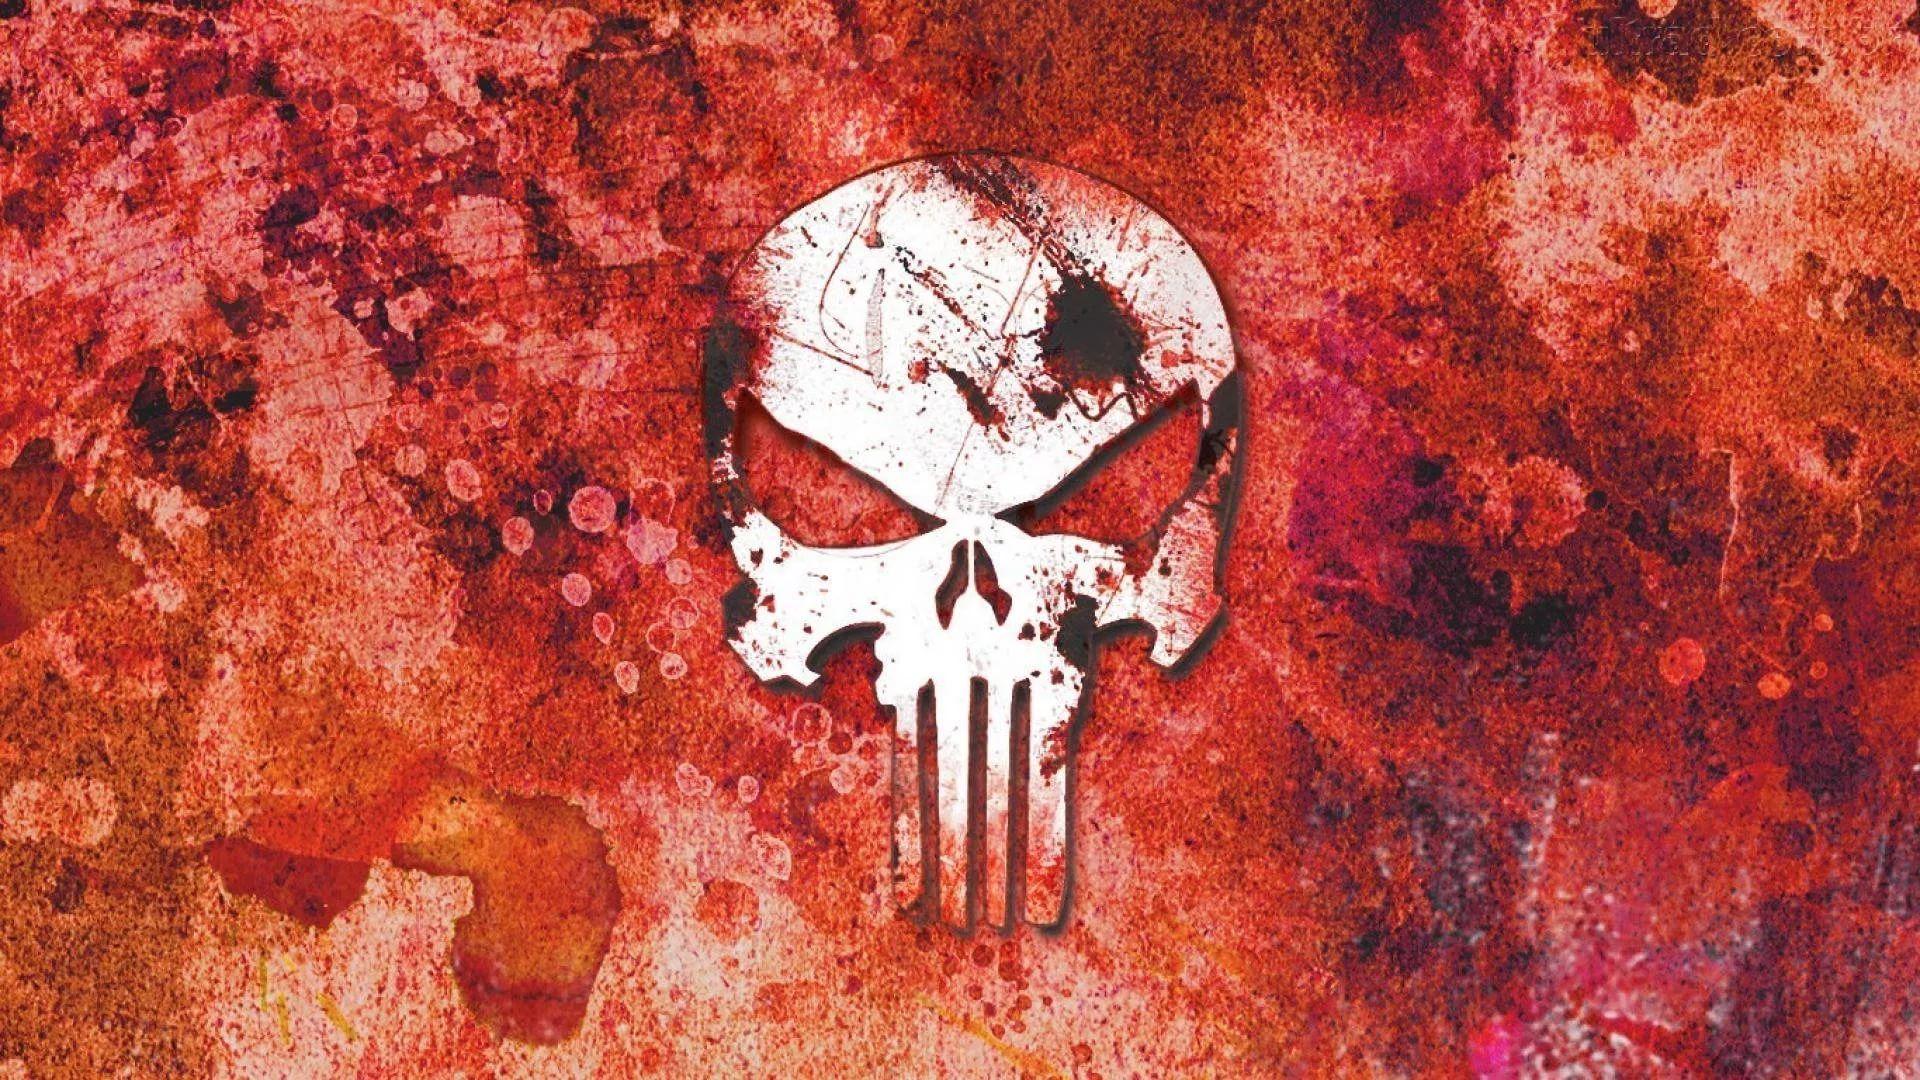 Punisher Skull PC Wallpaper HD